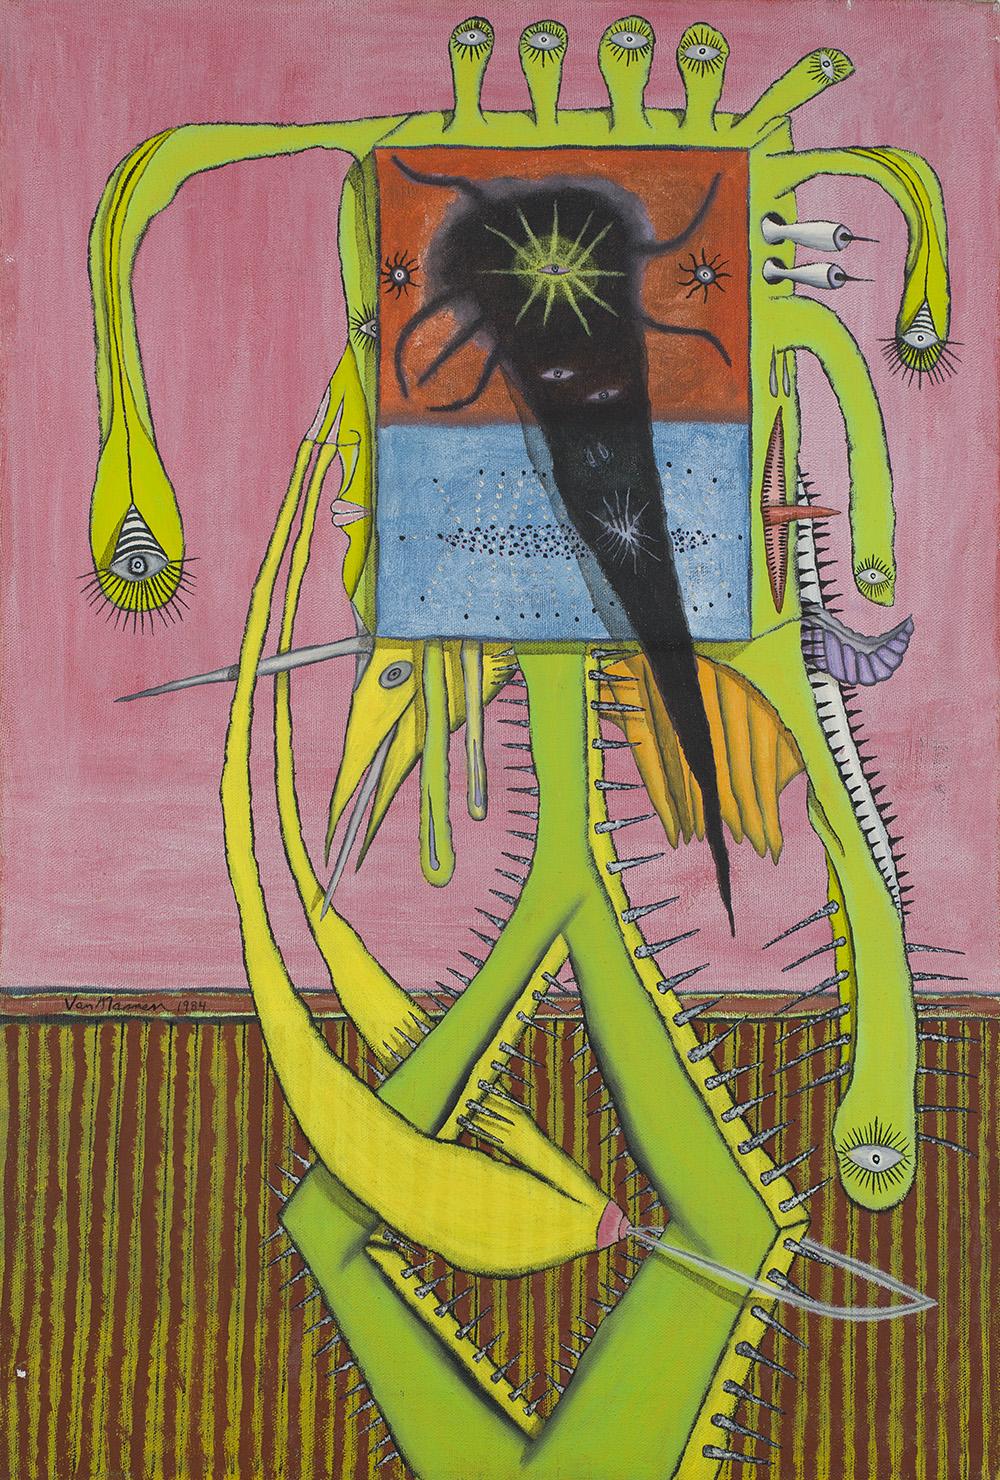 Gregory Van Maanen    Woman  , 5/1/1984 Acrylic on canvas 24 x 16 inches 61 x 40.6 cm GVM 98